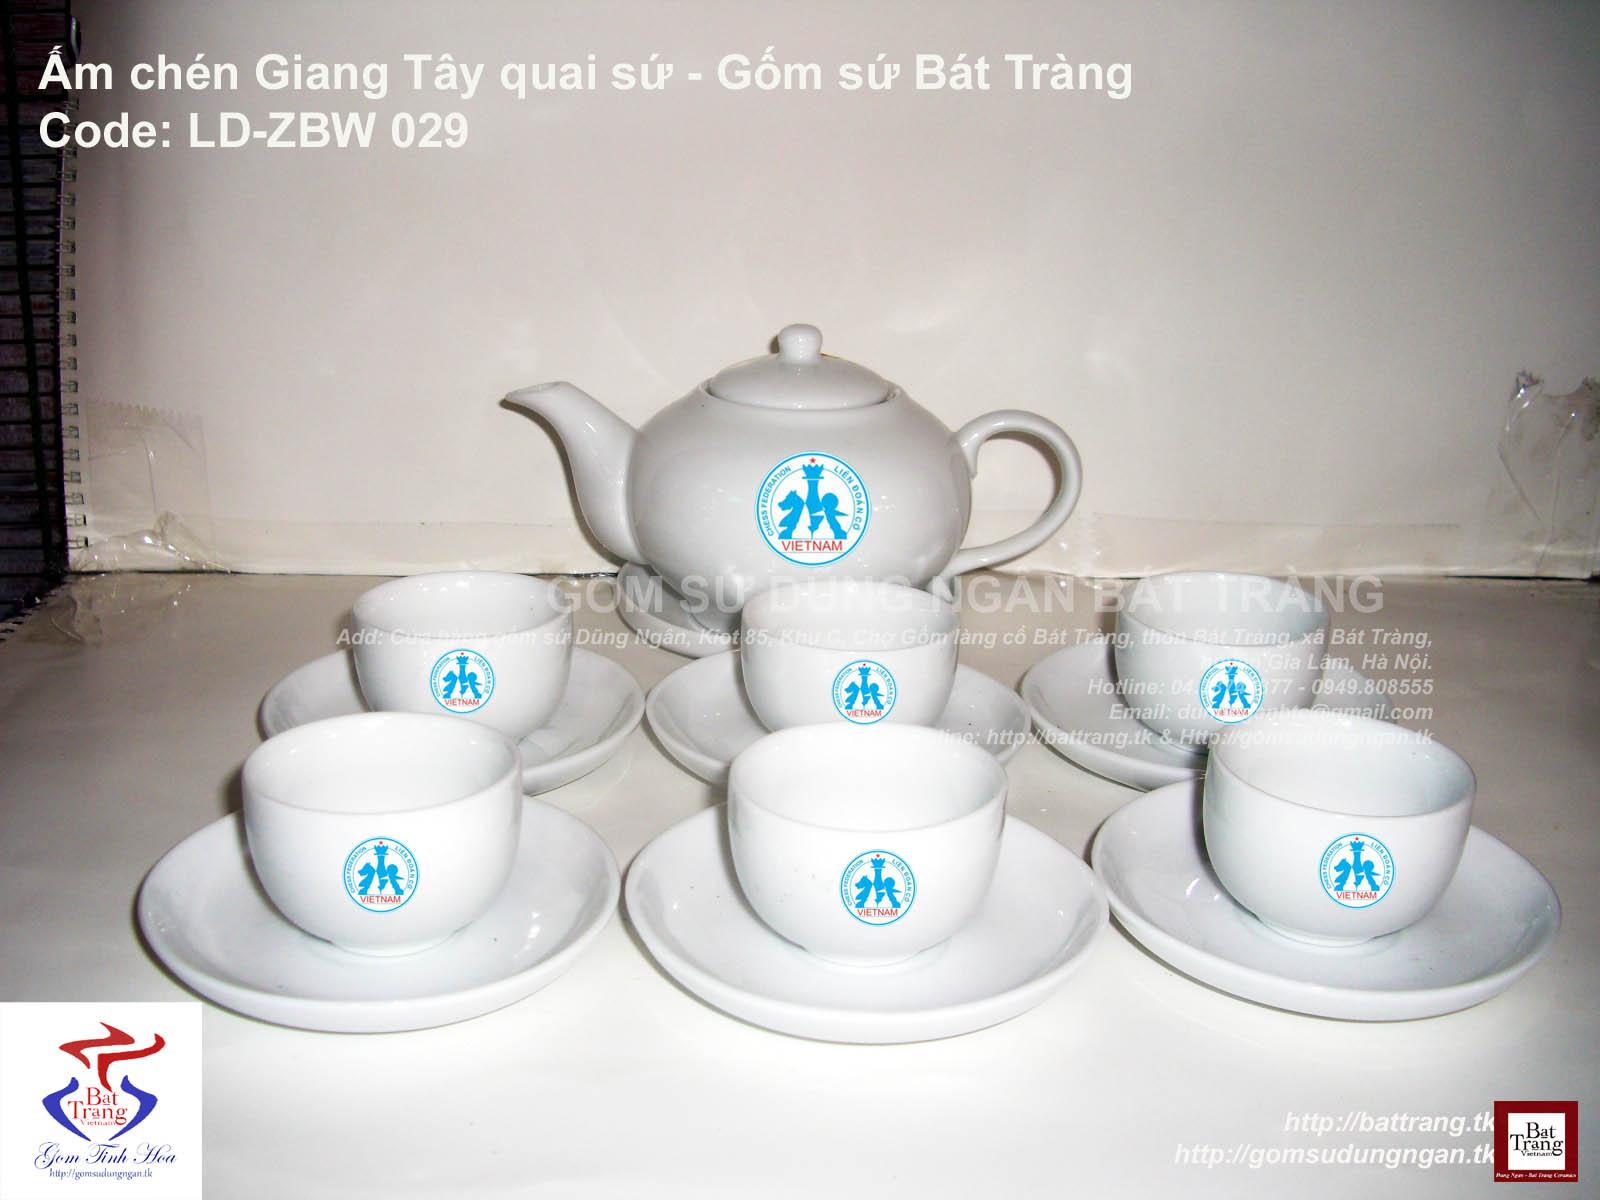 trang+in+logo+Qua+tang+Hoi+nghi+Hoi+thao+cong+ty+TNHH+Bat+Trang+Gom